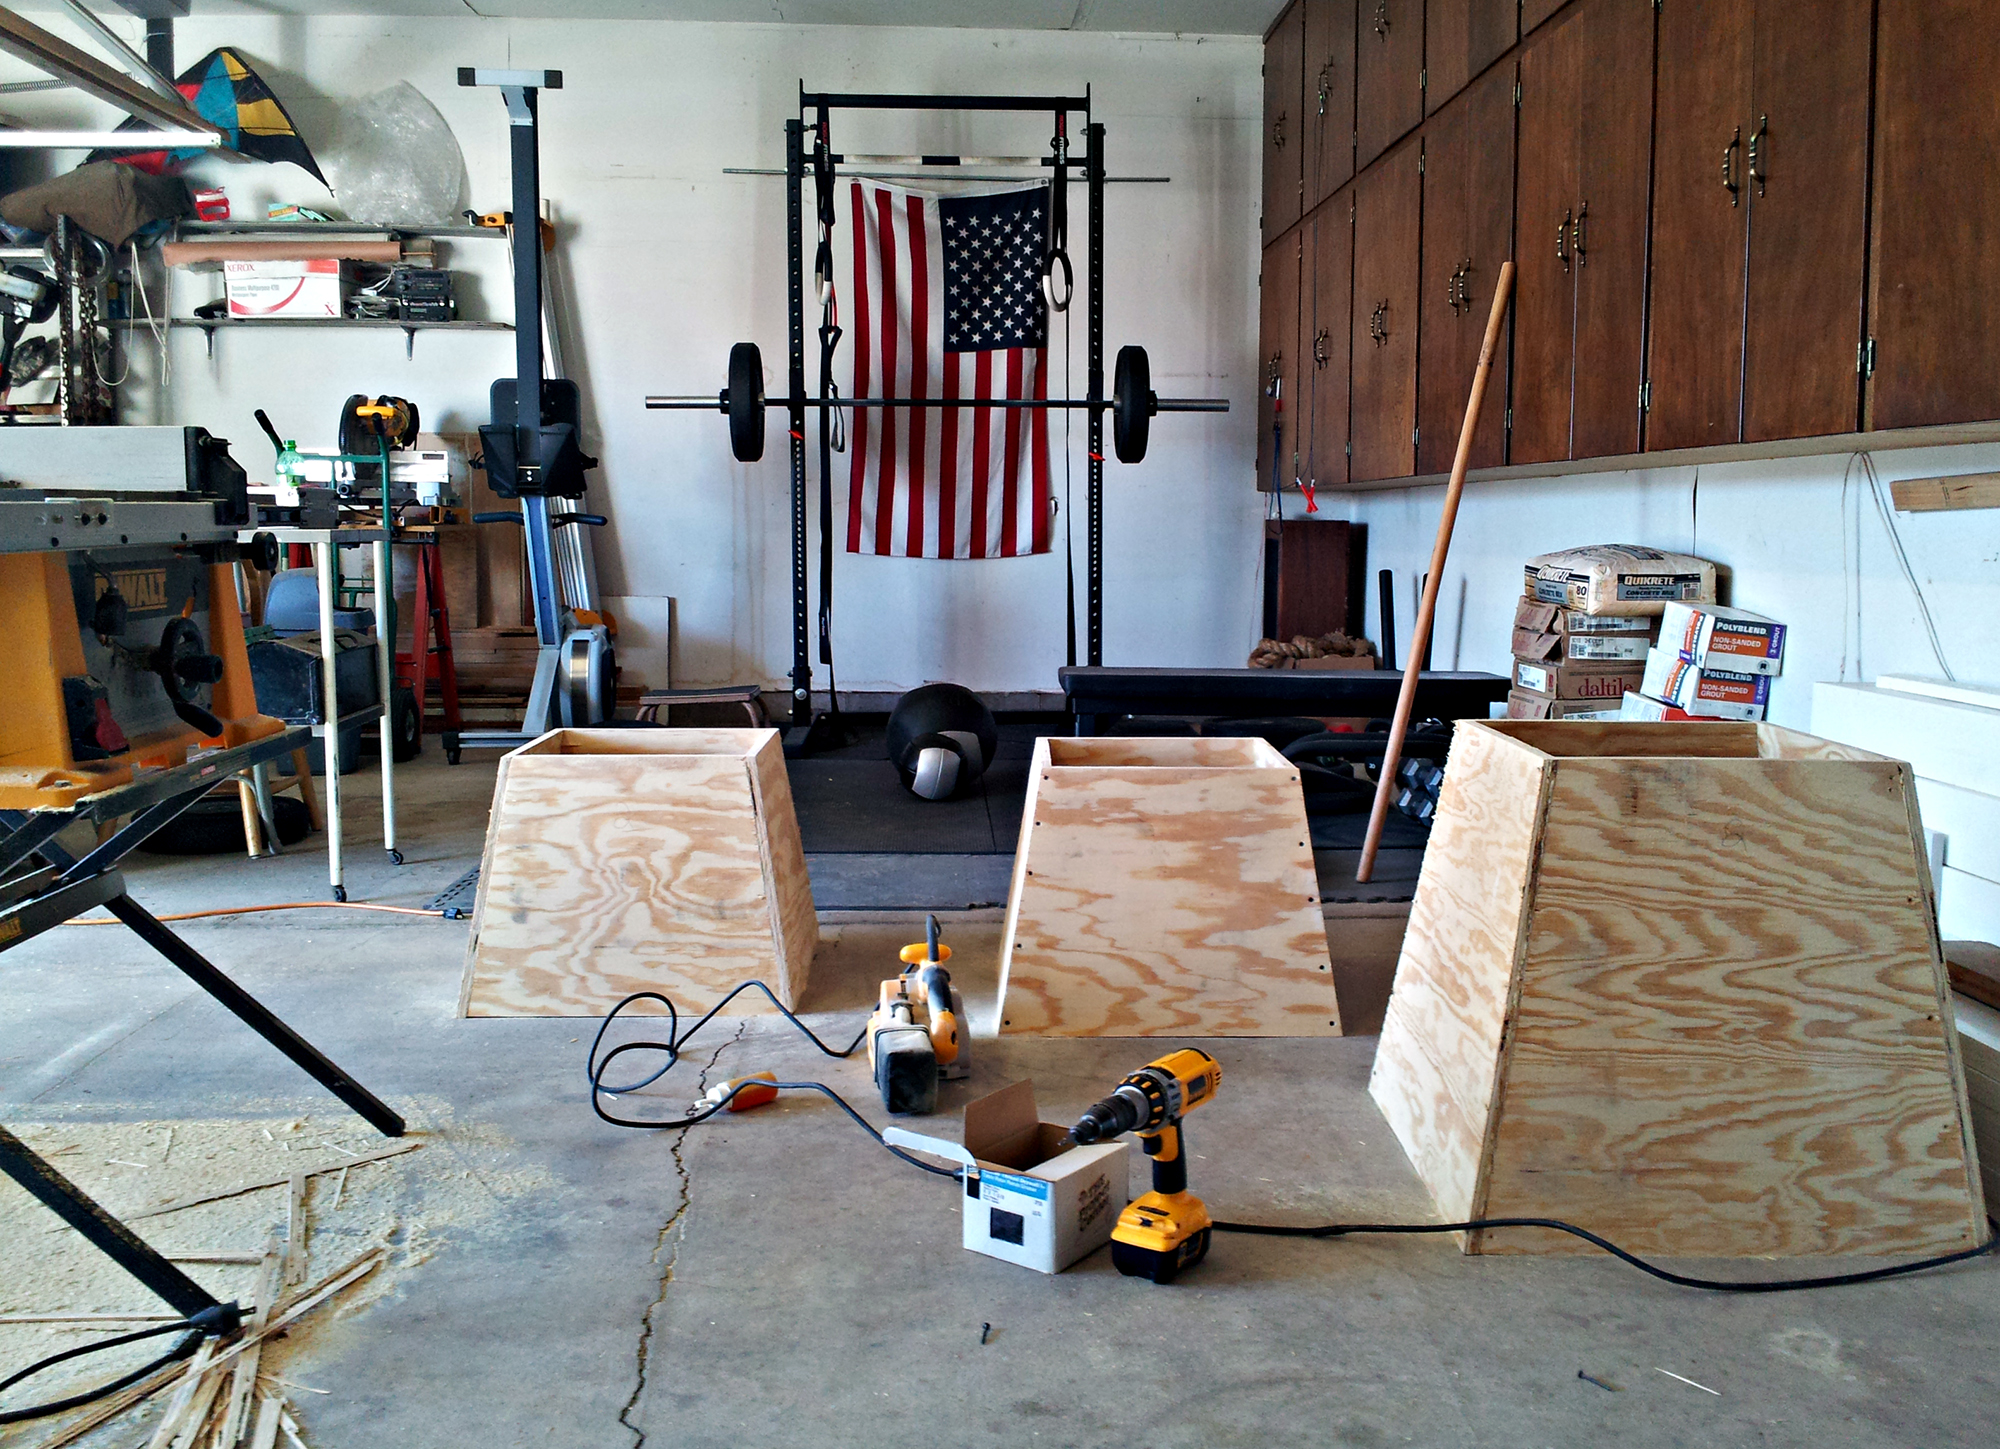 Crossfit forging elite fitness saturday